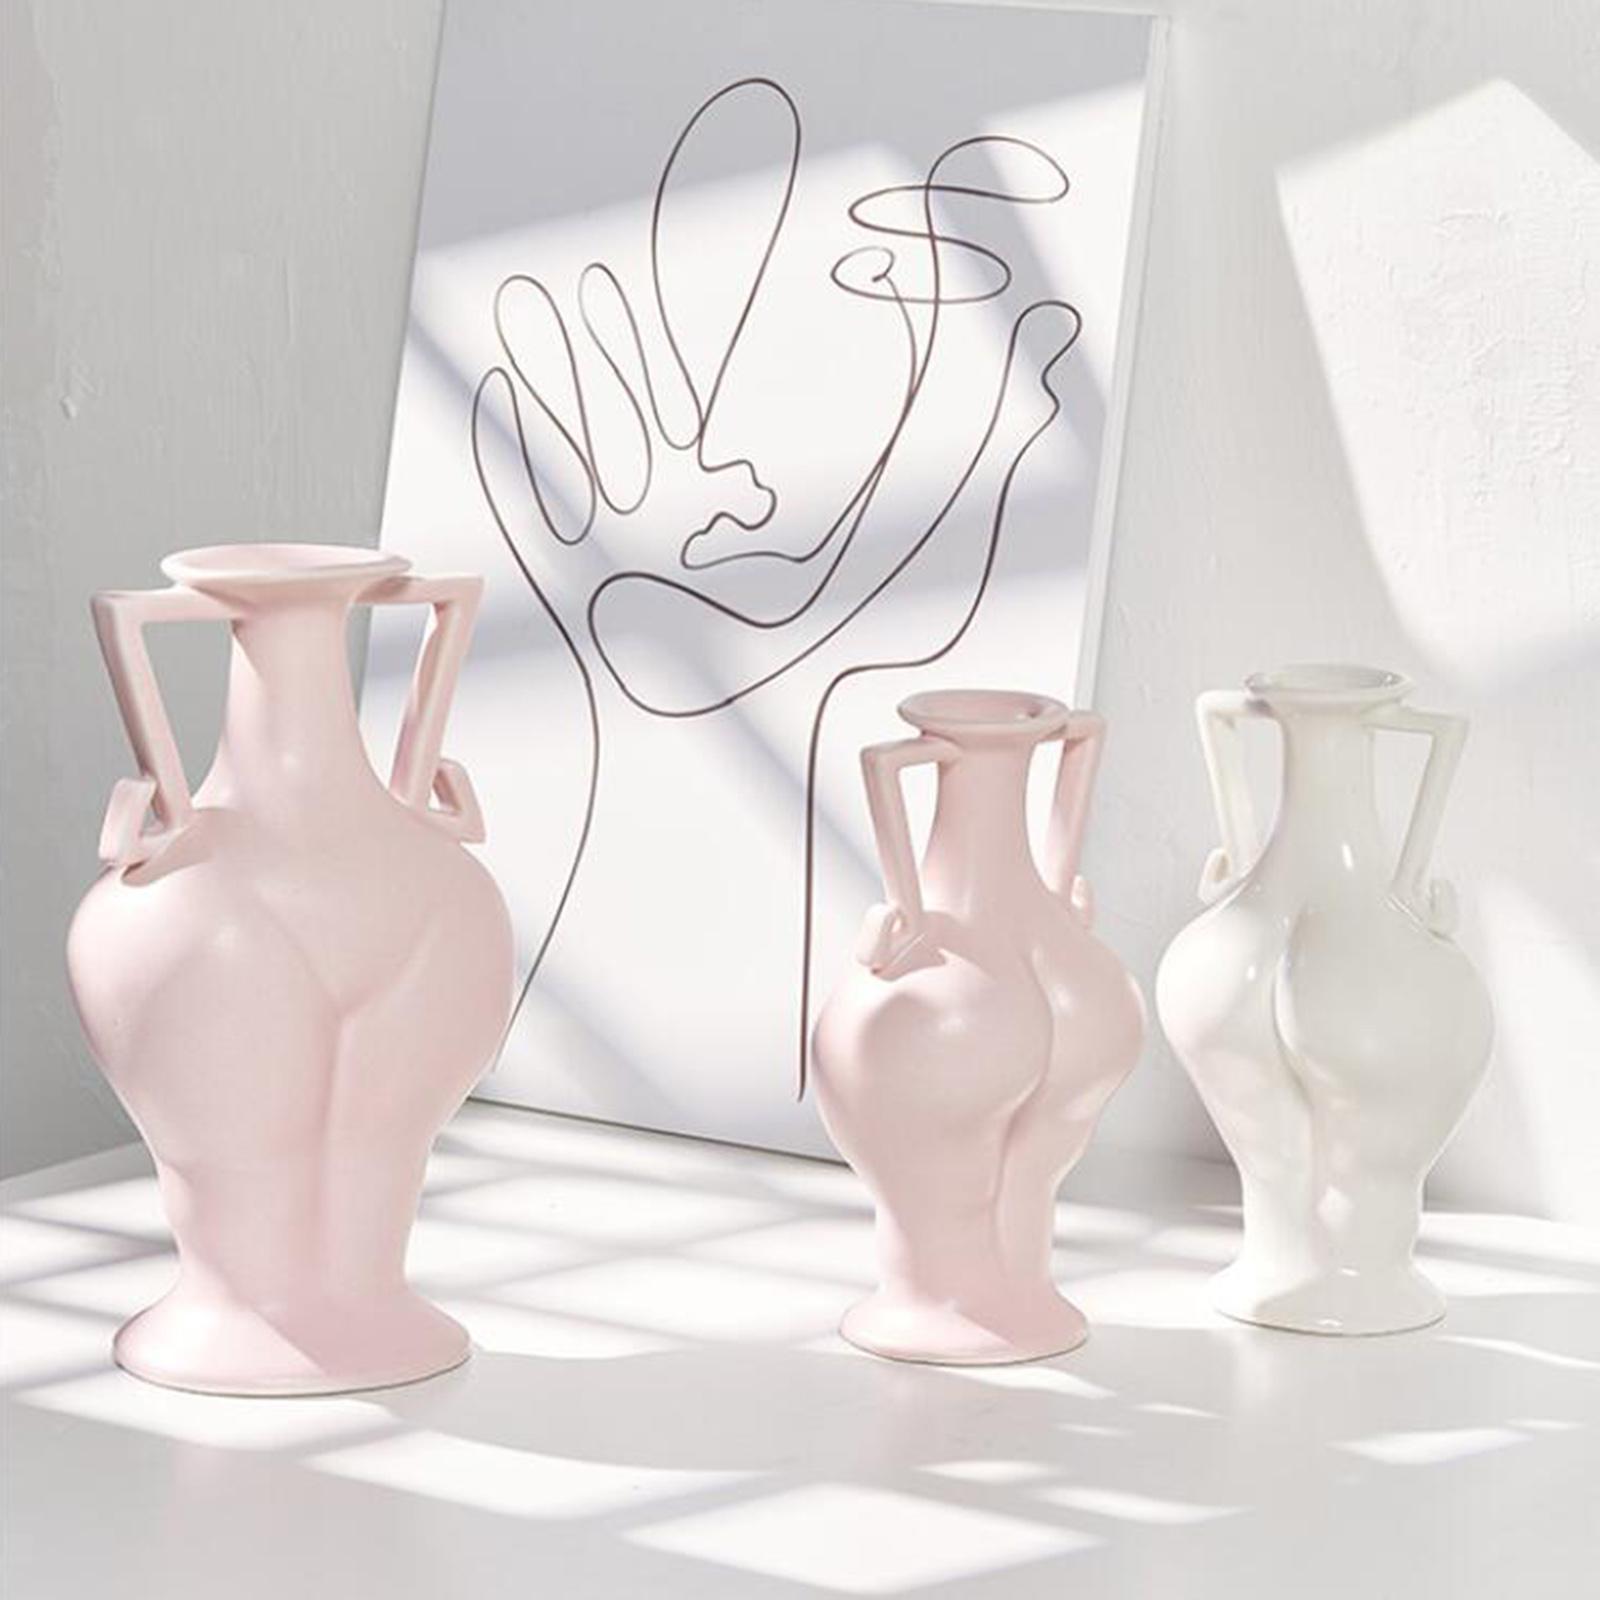 Indexbild 34 - Blumenvase Keramik Blumentöpfe Trockenblumenhalter Pflanzenvasen Wohnkultur